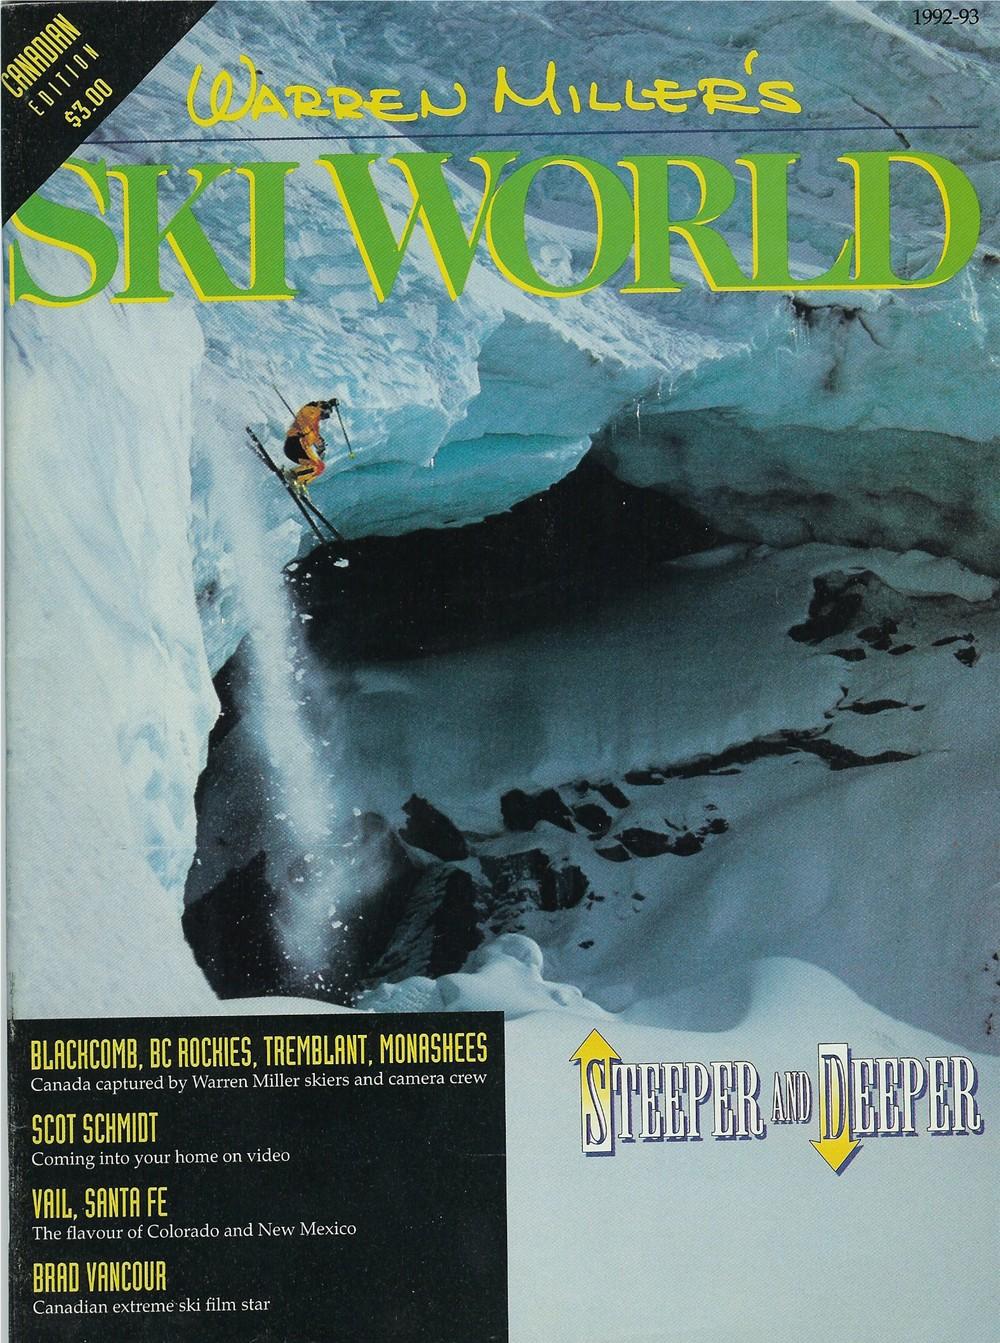 Magazine Cover1-Brad Vancour-1992.jpg